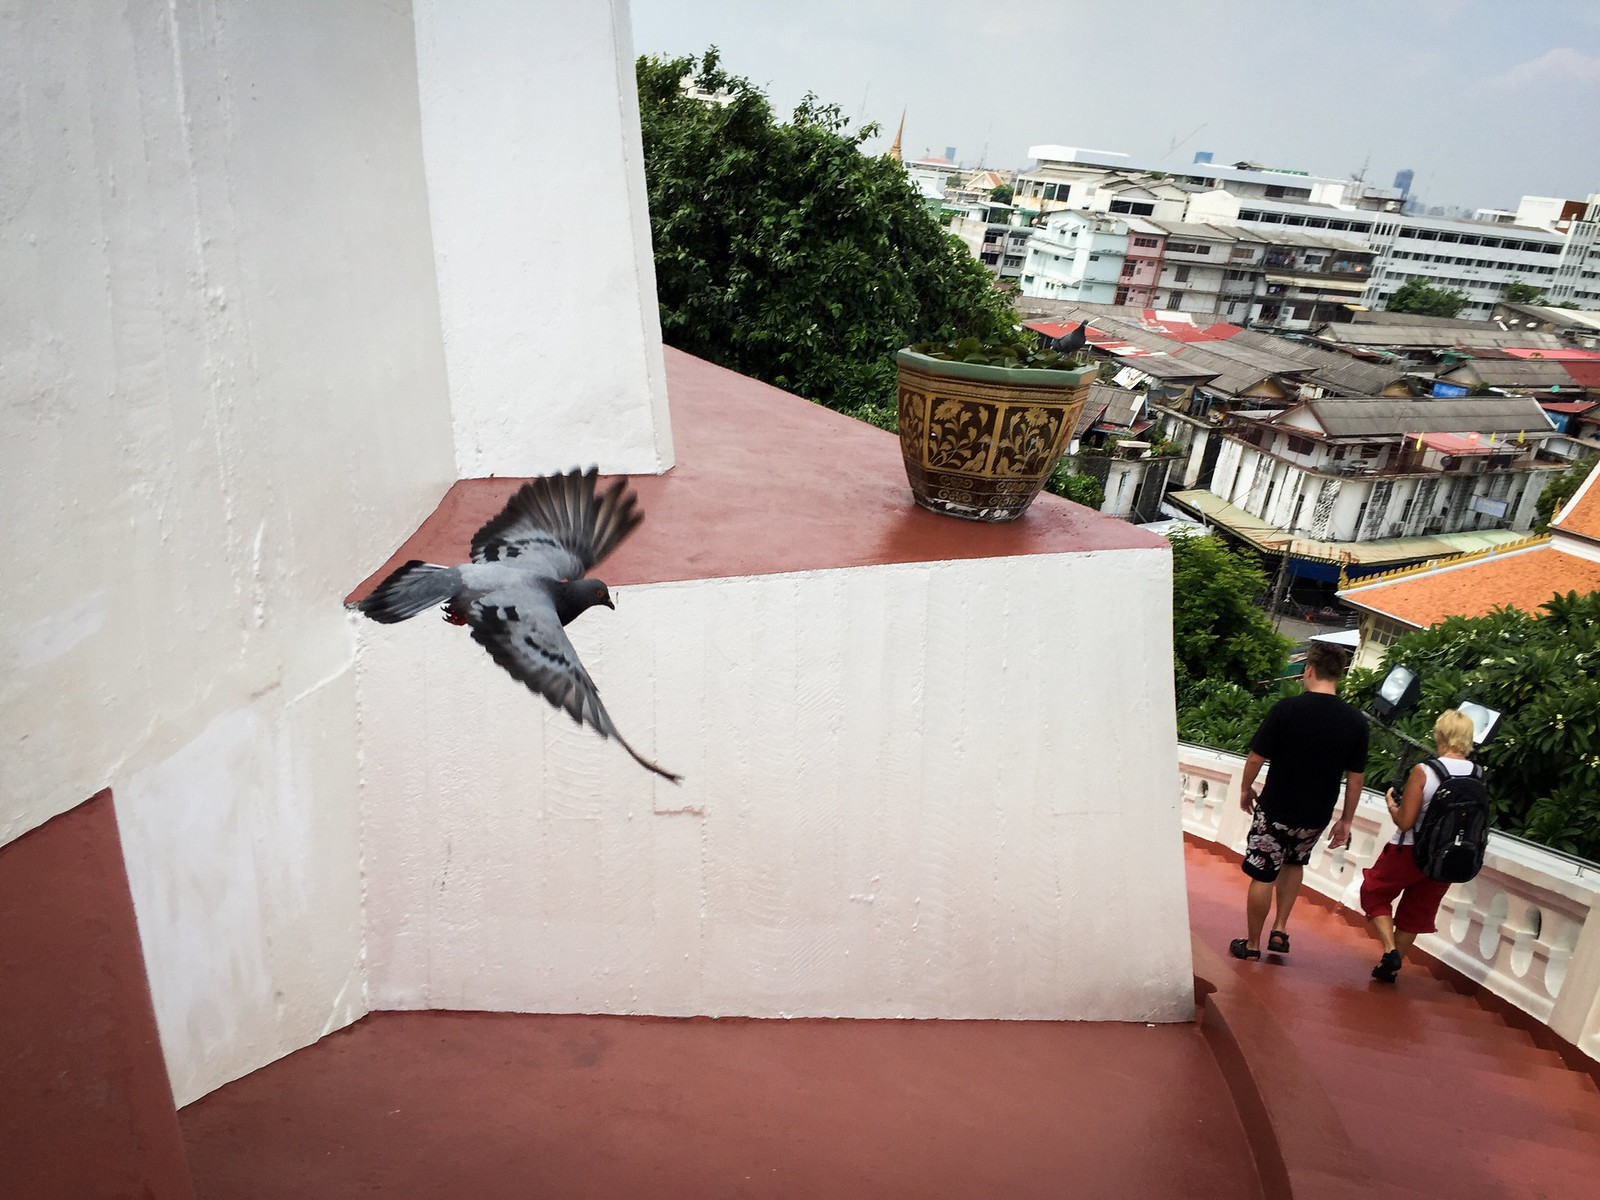 flying  !!   by Audsadang Satsadee